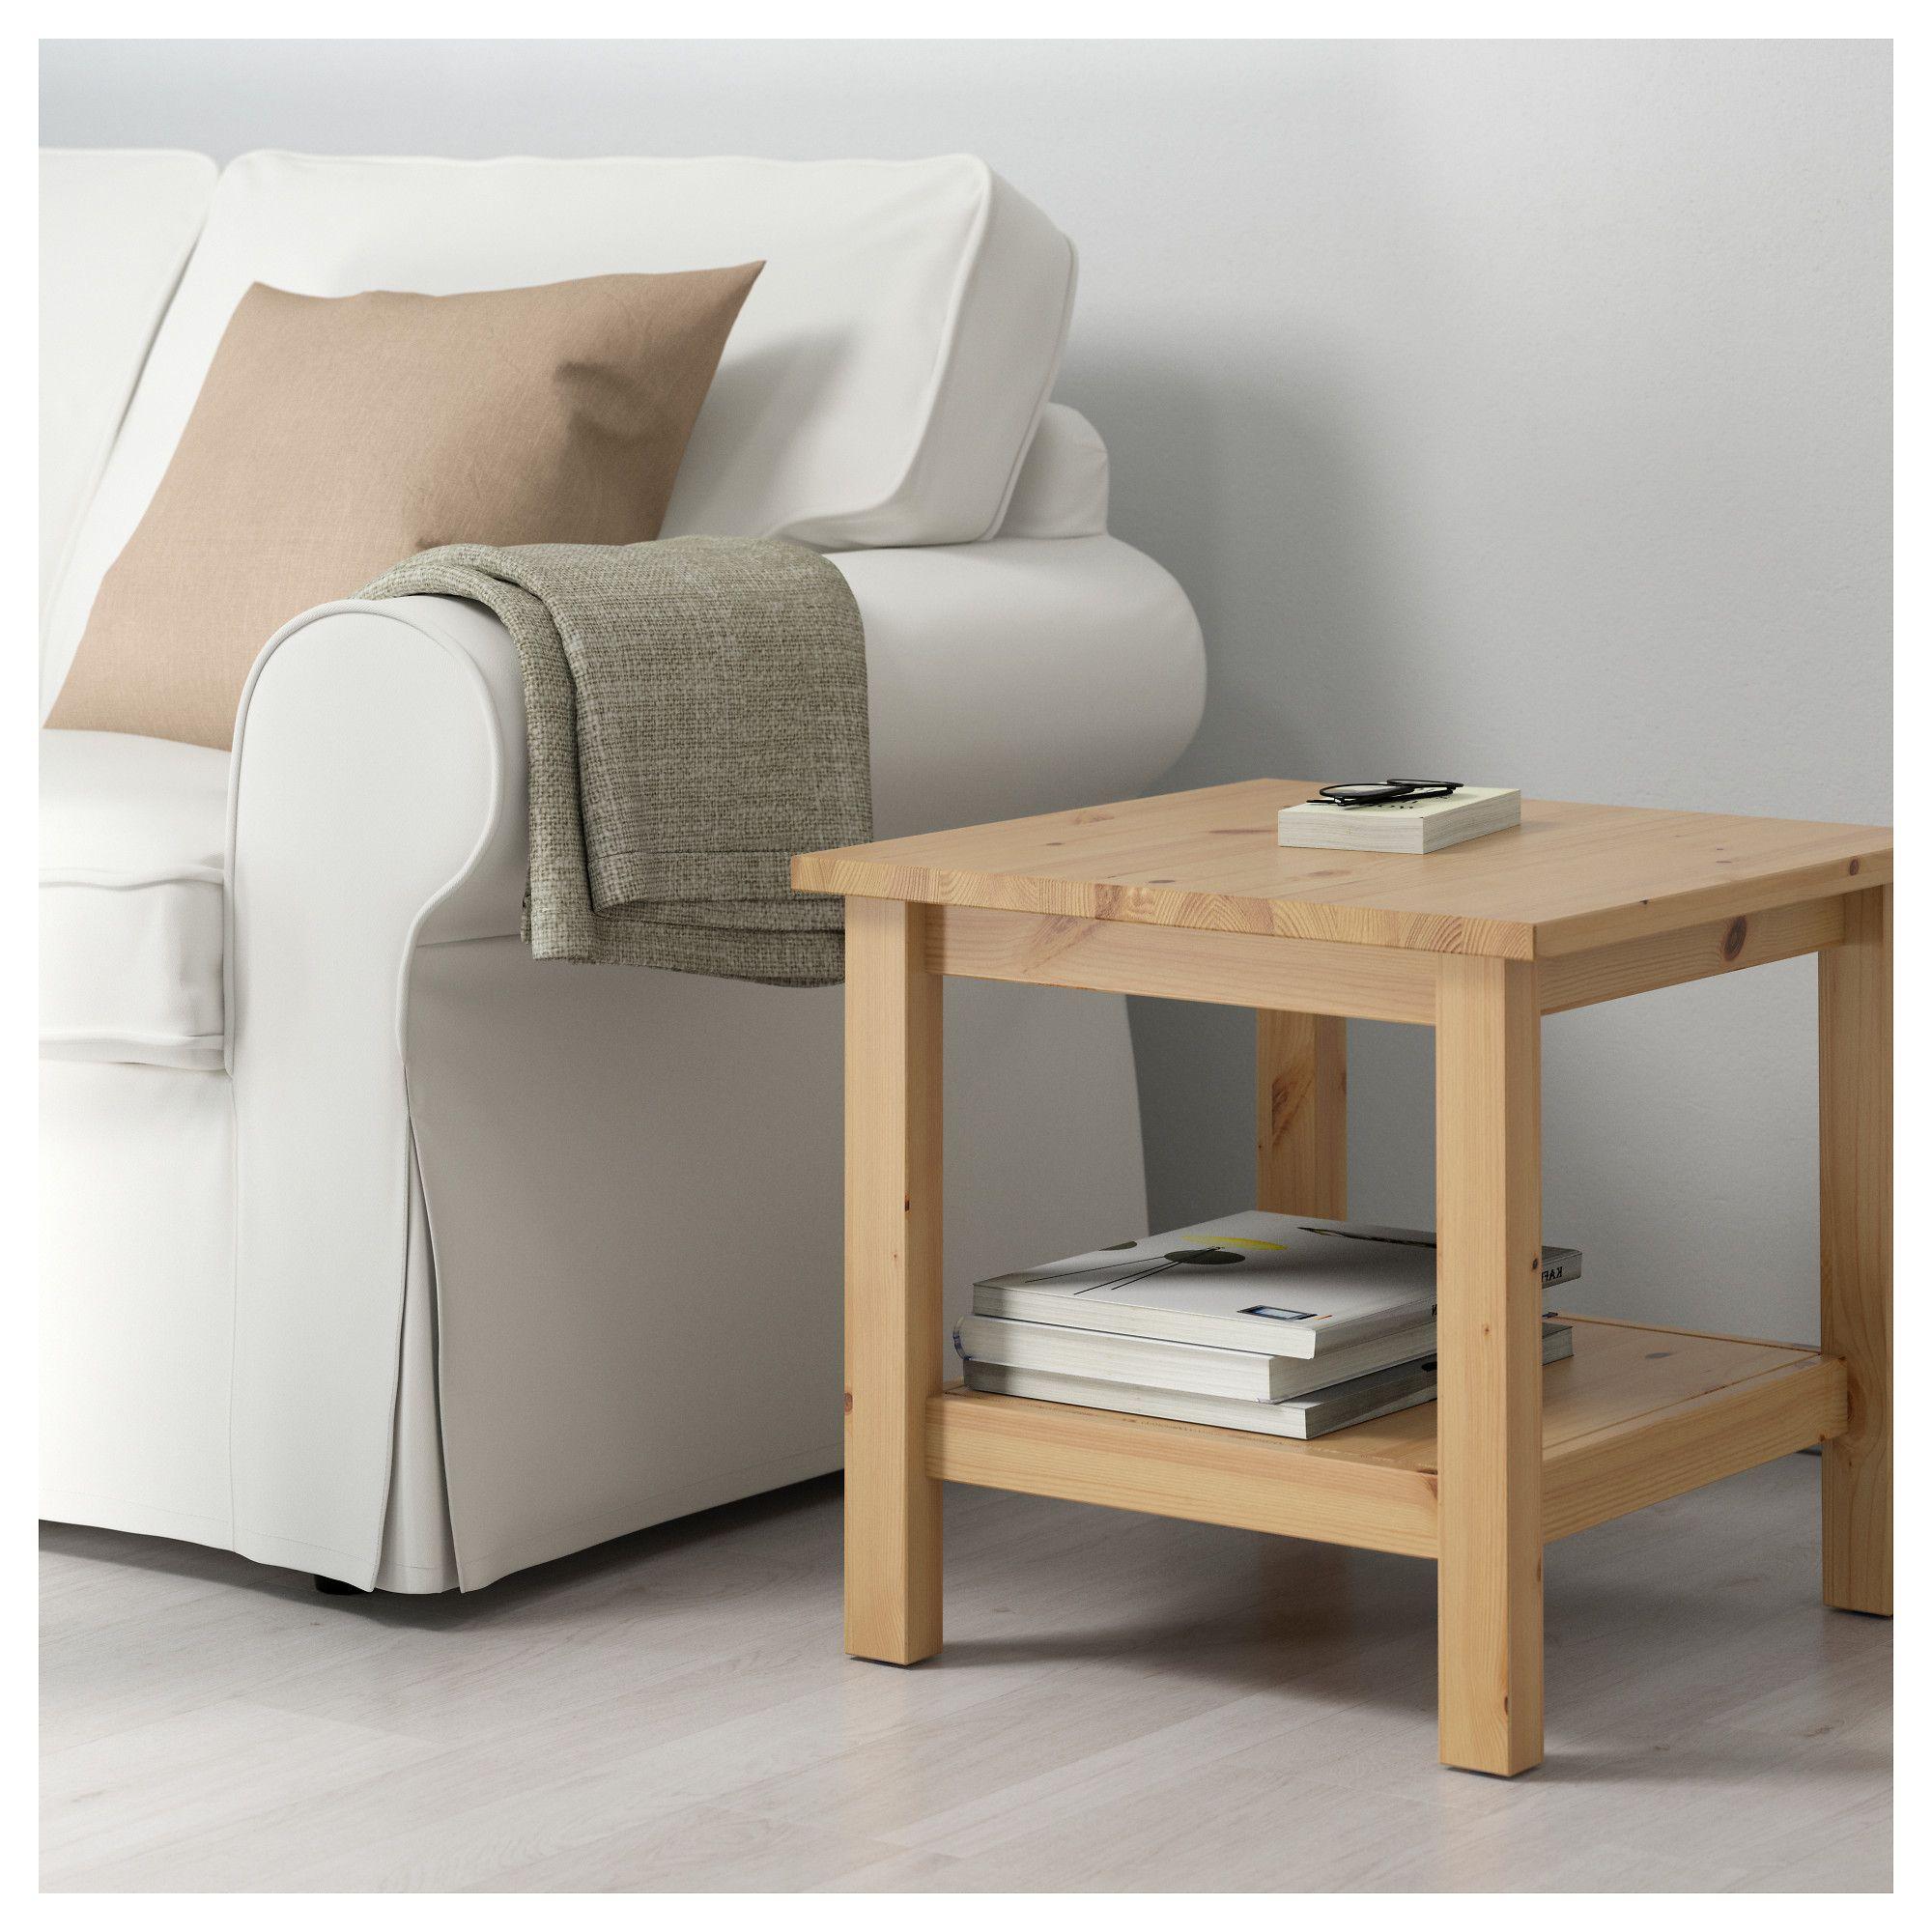 Furniture and Home Furnishings | Ikea side table, White ...